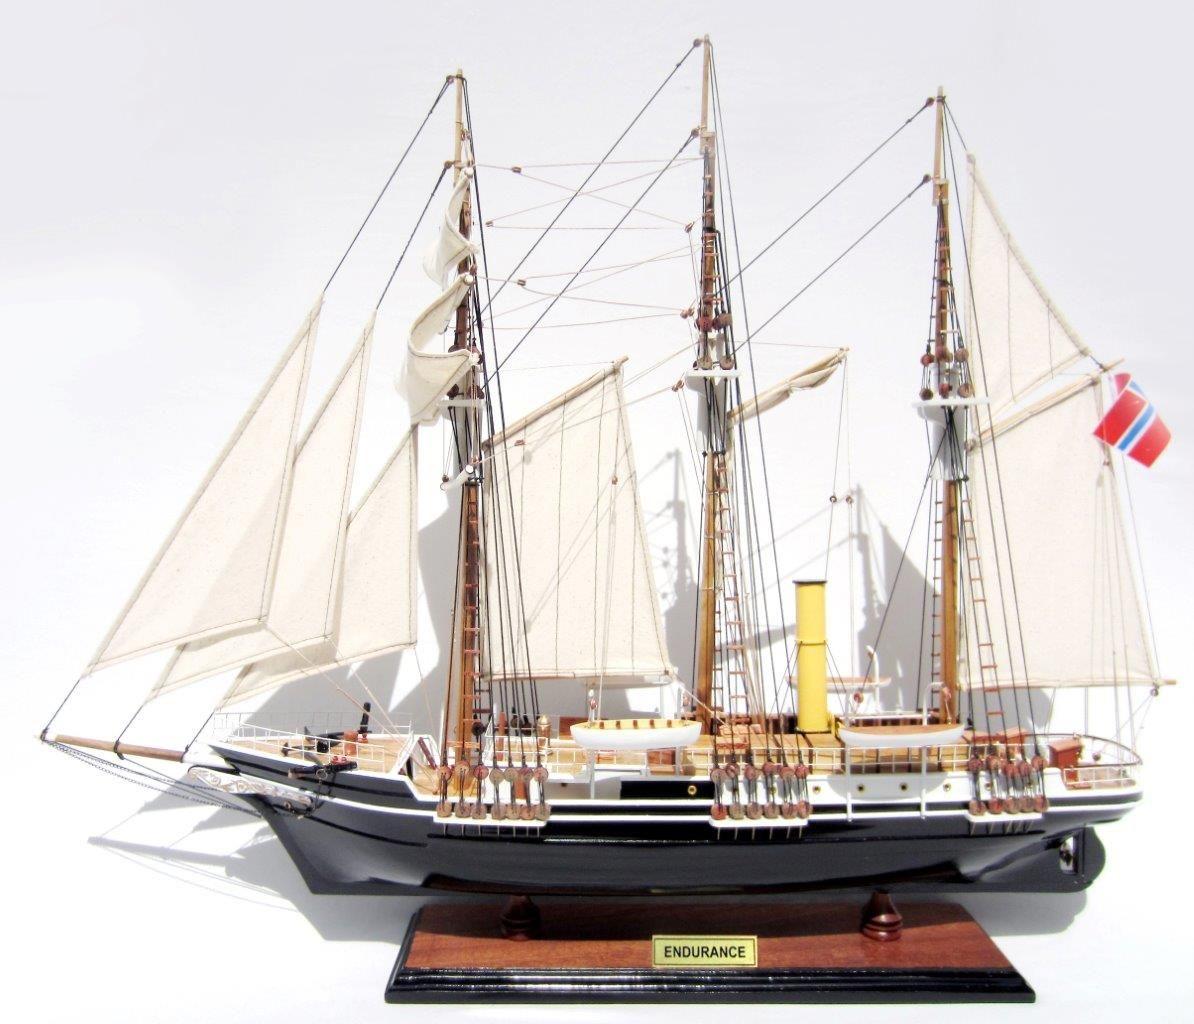 Endurance Model Boat - GN (TS0059P-1)